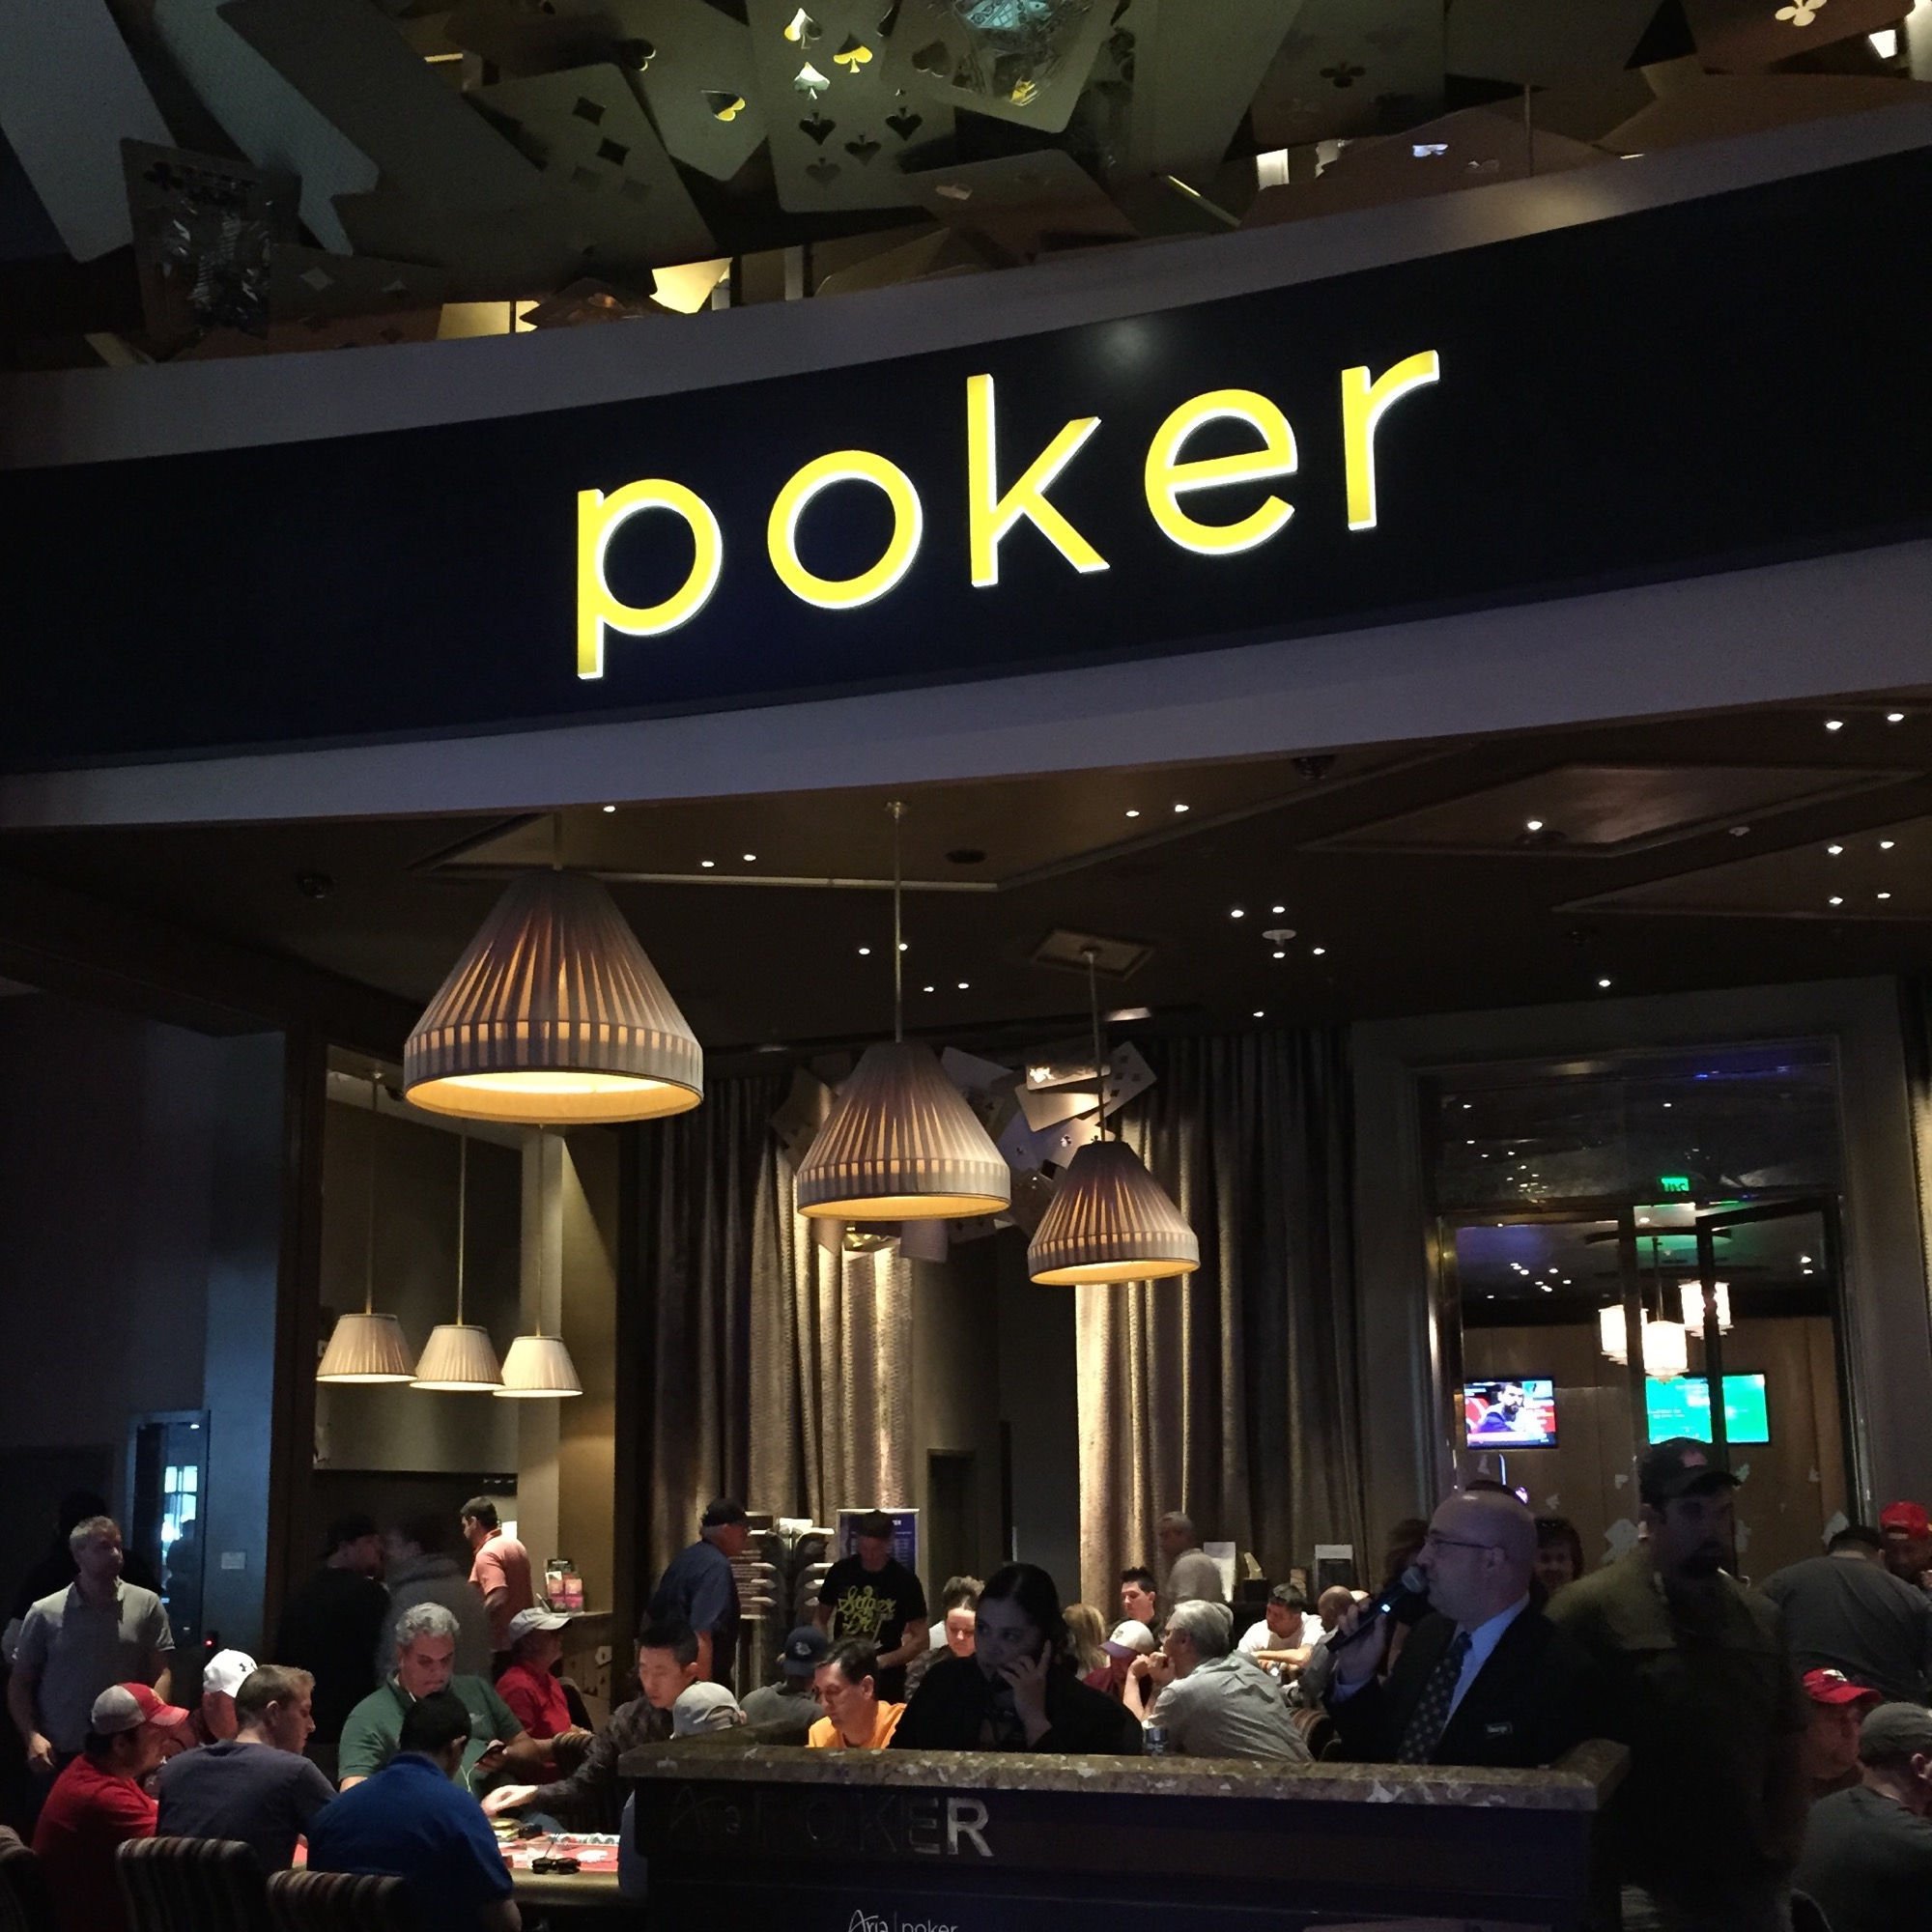 Aria casino las vegas poker grandia 2 pc save game editor